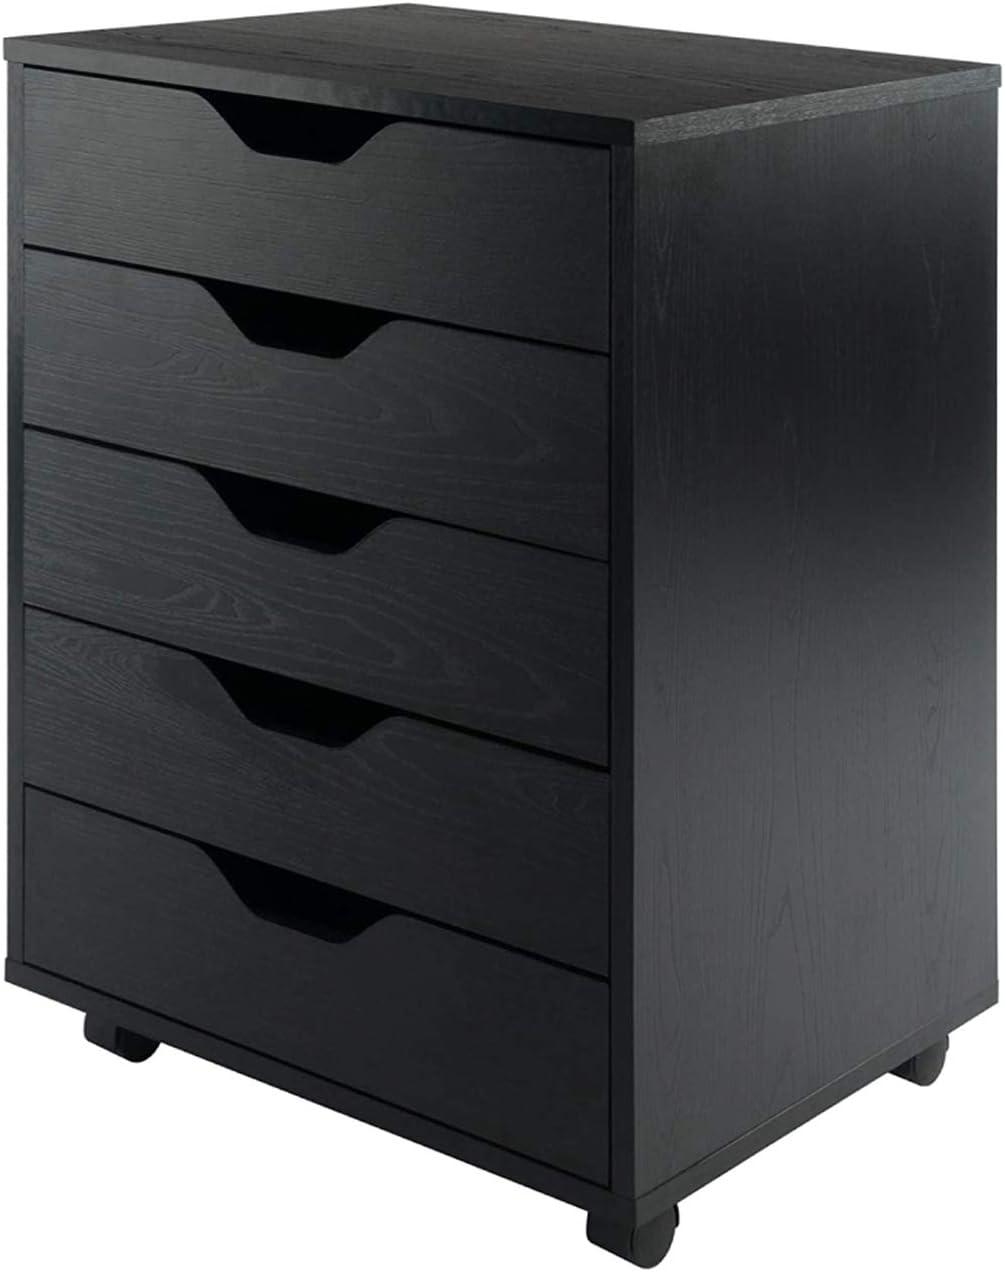 5-Drawer Wood Filing Cabinet, Mobile Storage Cabinet for Closet/Office Black Color Classic File Cabinets Storage Filing Cabinet for Home Office,Anti-tilt Structure